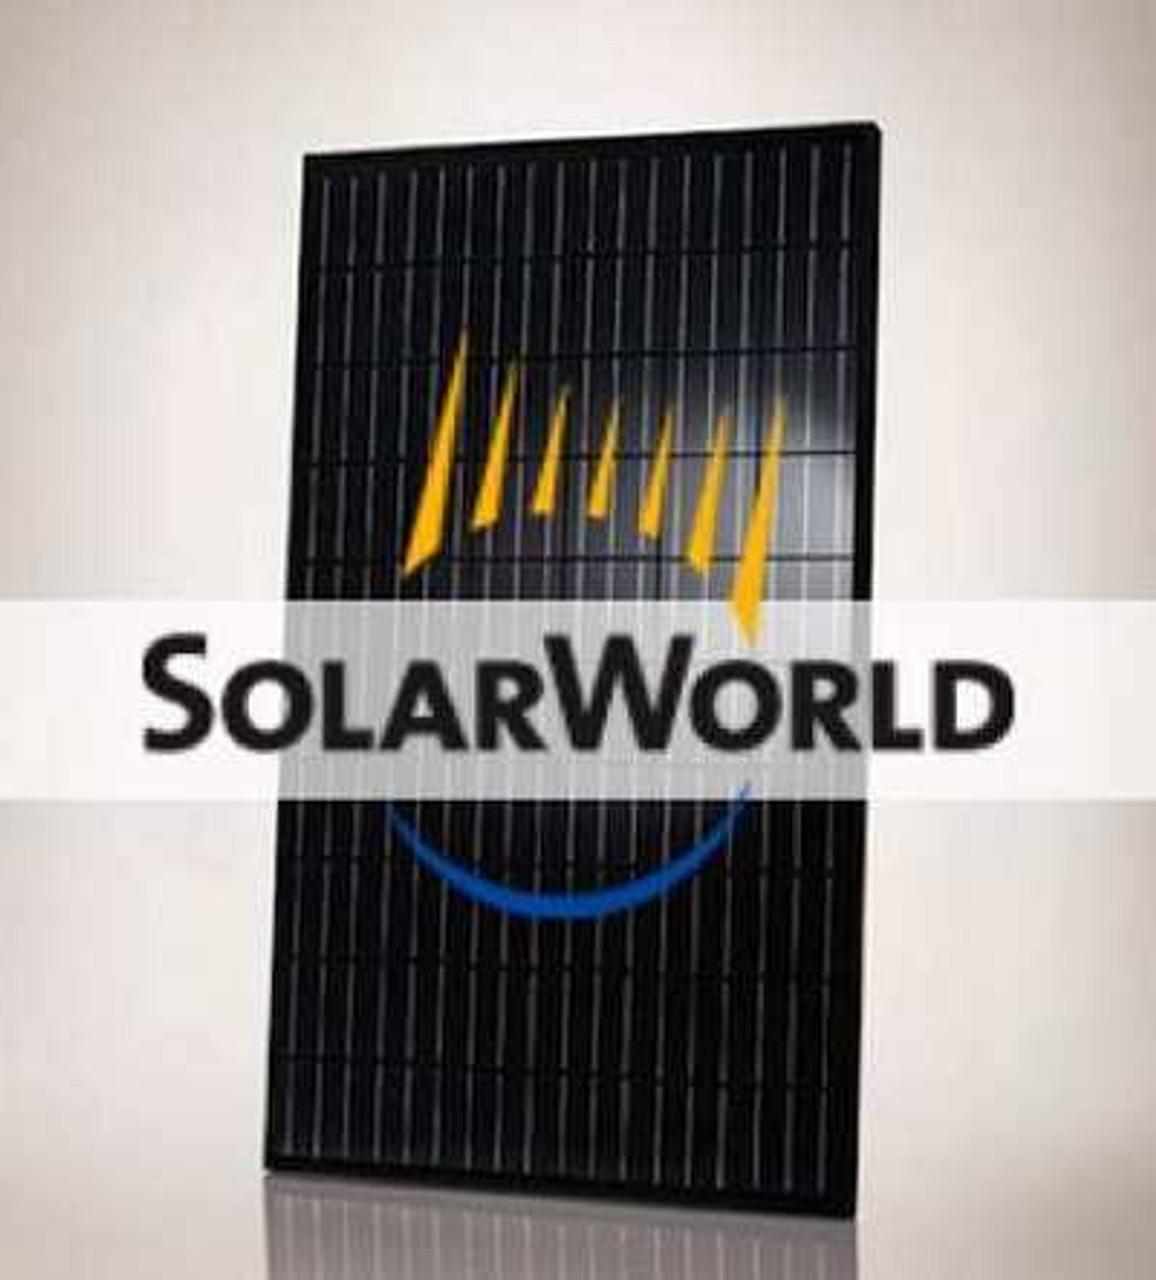 SolarWorld SW280M 280 Watt 24V Monocrystalline Solar Panel